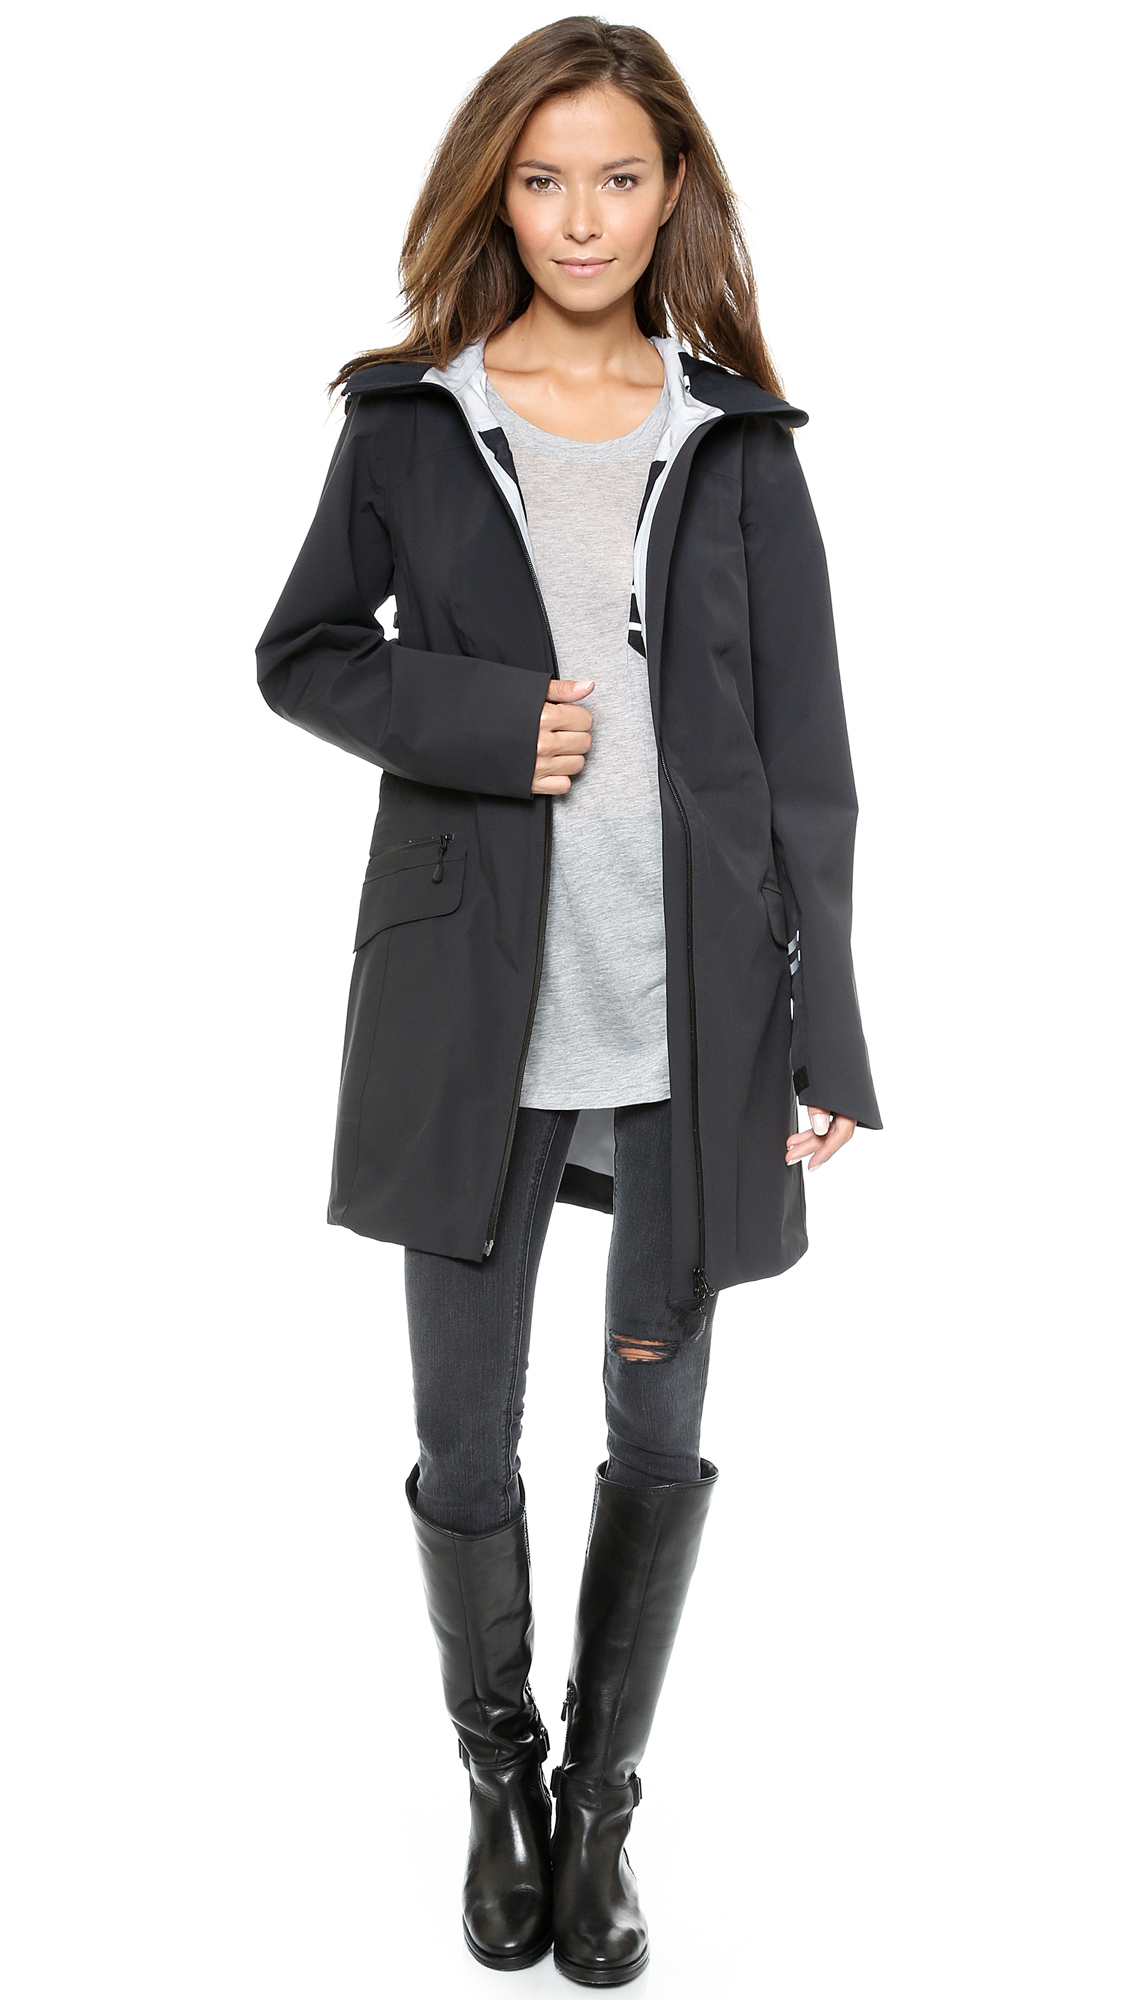 Canada Goose' Coastal Shell Jacket - Women's Medium - Black